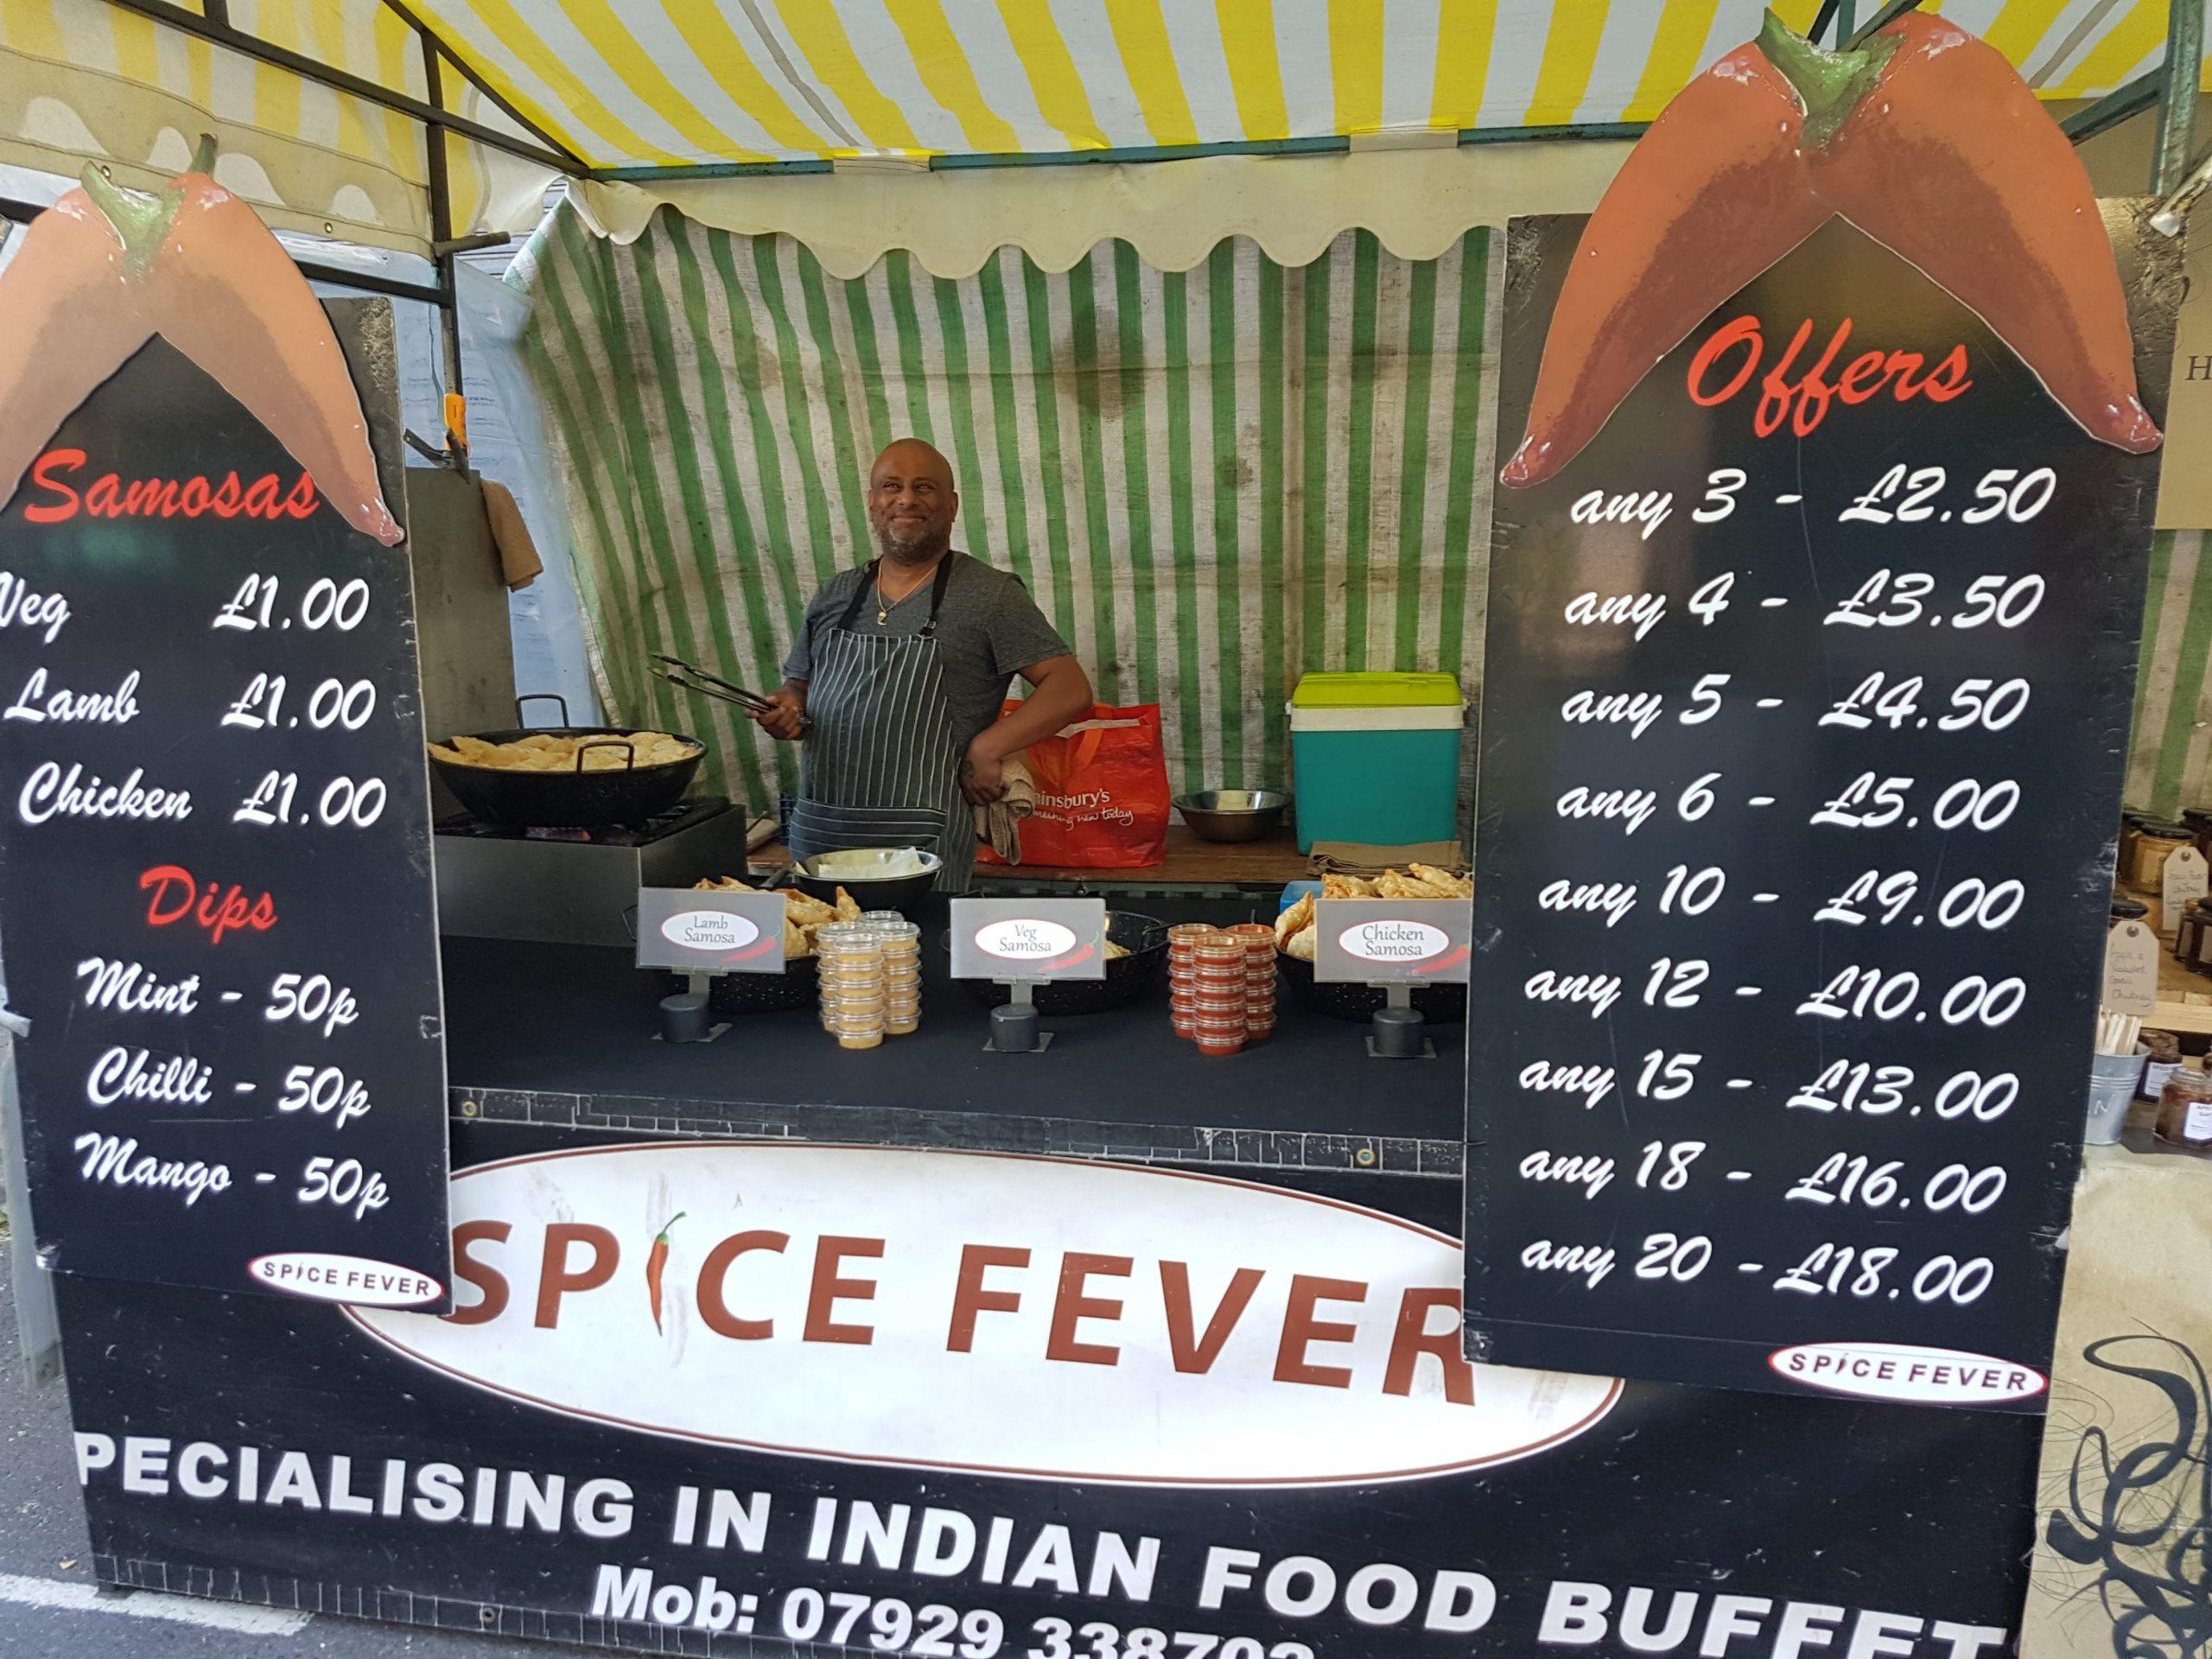 Spice Fever